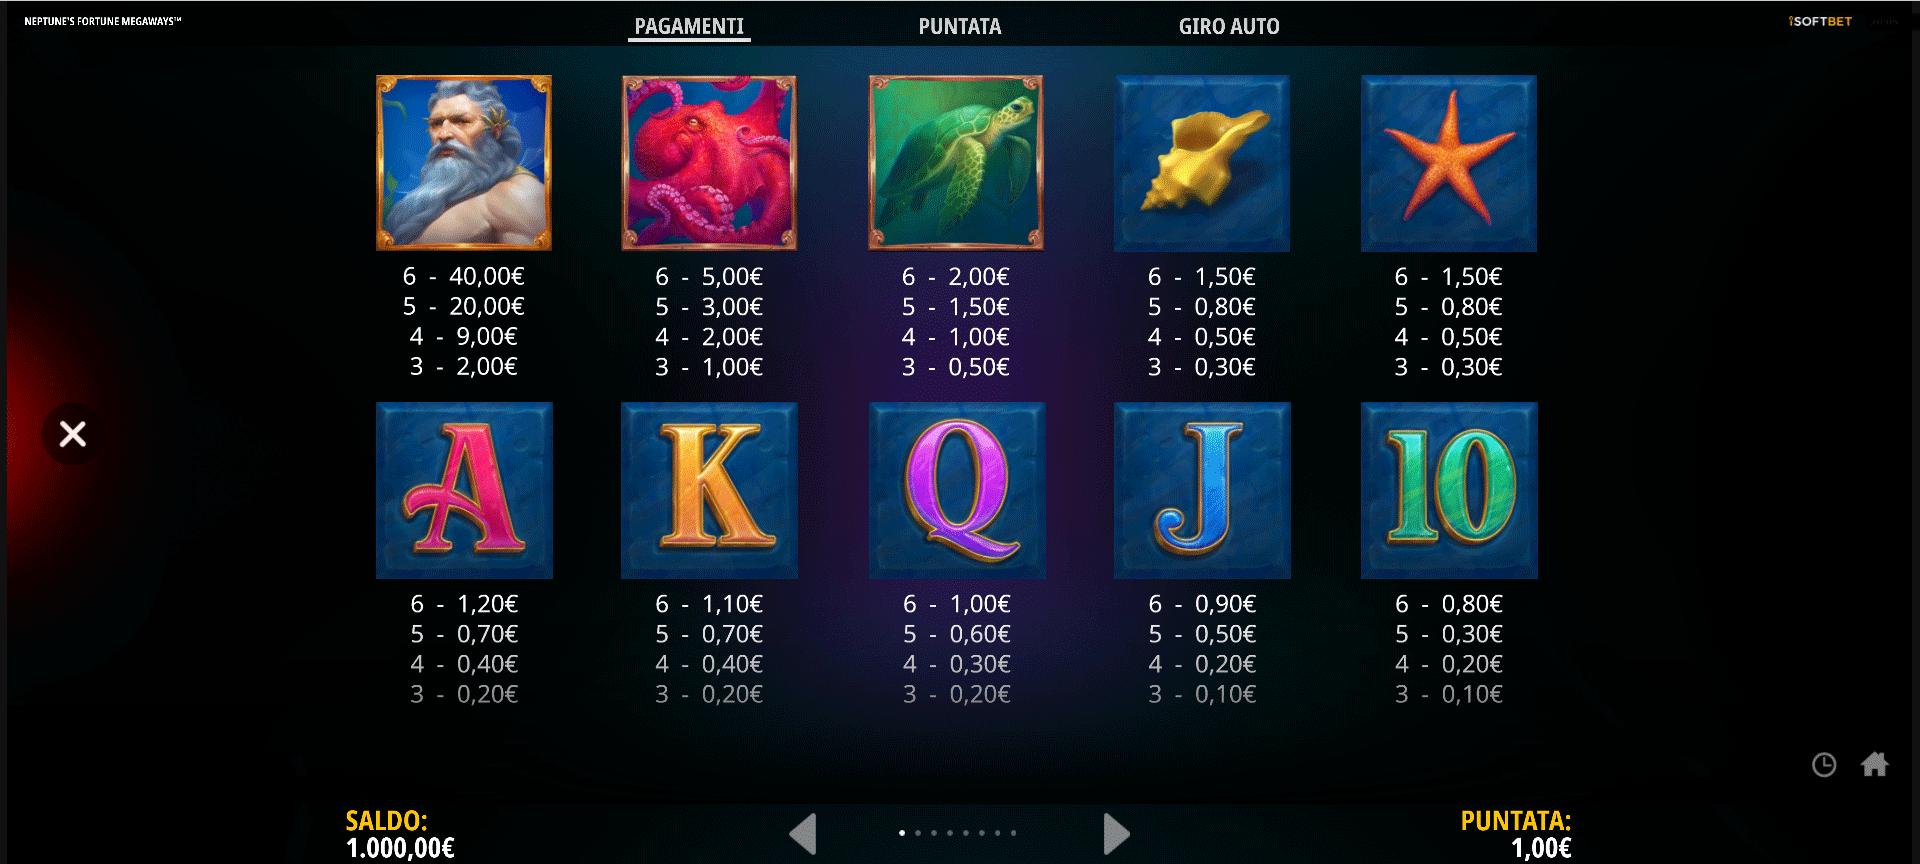 paytable della slot machine Neptune's Fortune Megaways